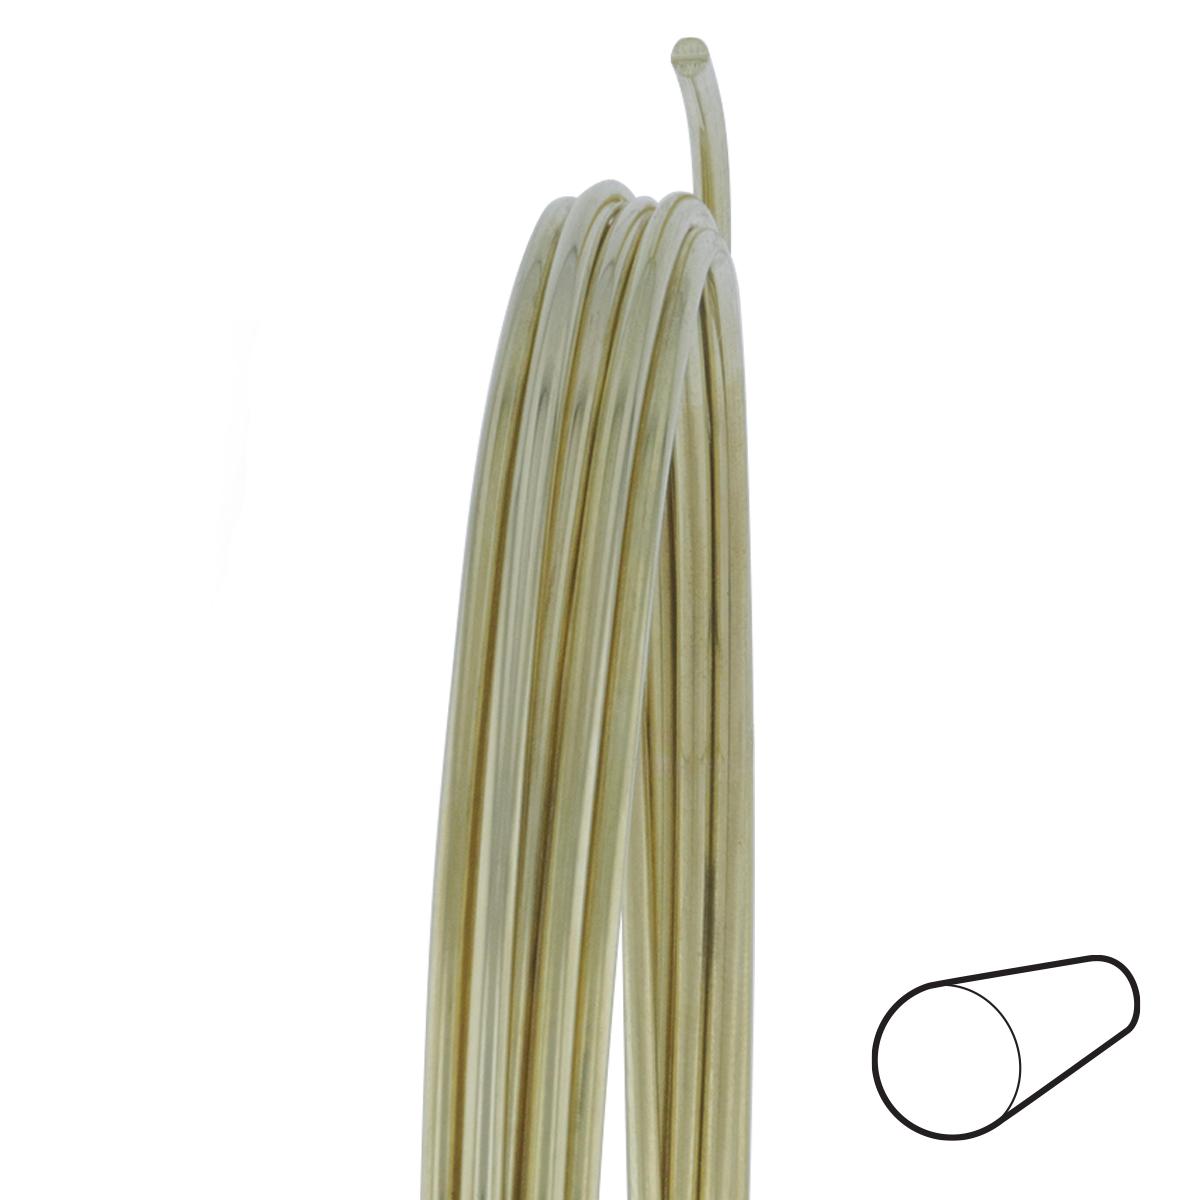 24-Gauge Wire - 24 Gauge Wire by WireJewelry.com